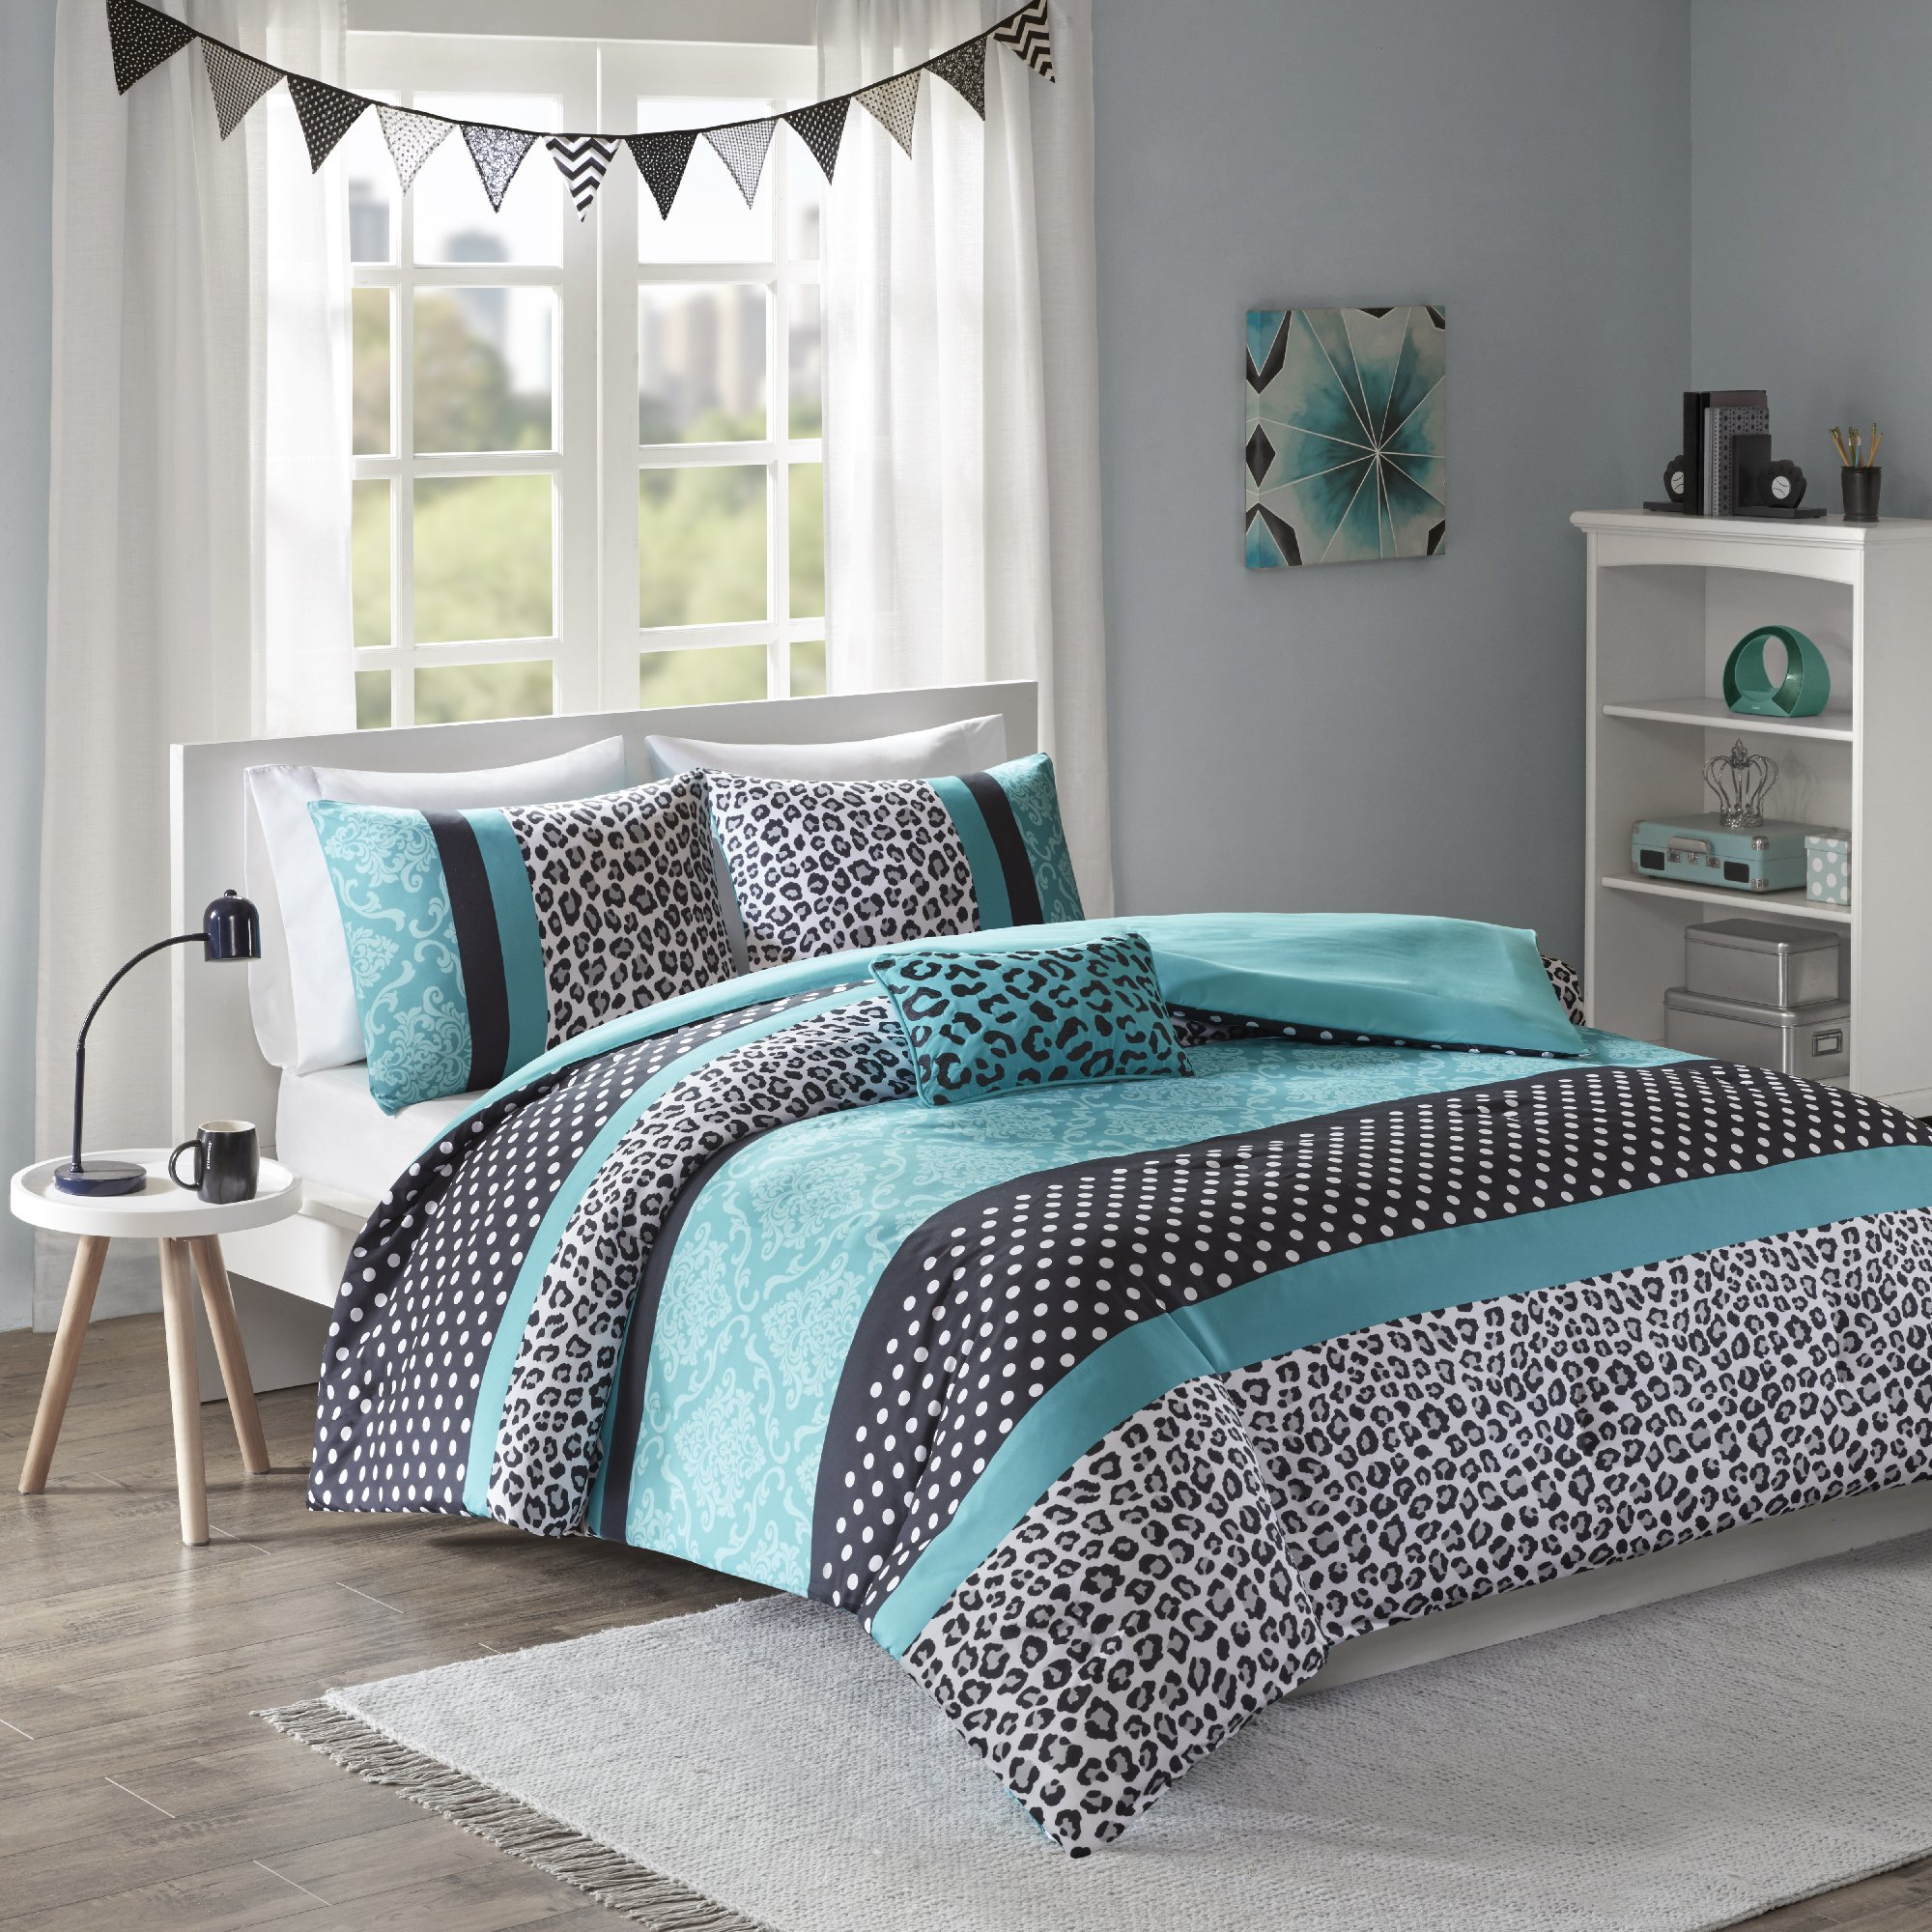 Mi-Zone Chloe Teen Girls Duvet Cover Set Full/Queen Size - Teal, Polka Dots, Damask, Leopard – 4 Piece Duvet Covers Bedding Sets – Ultra Soft Microfiber Girls Bedding Bed Sets